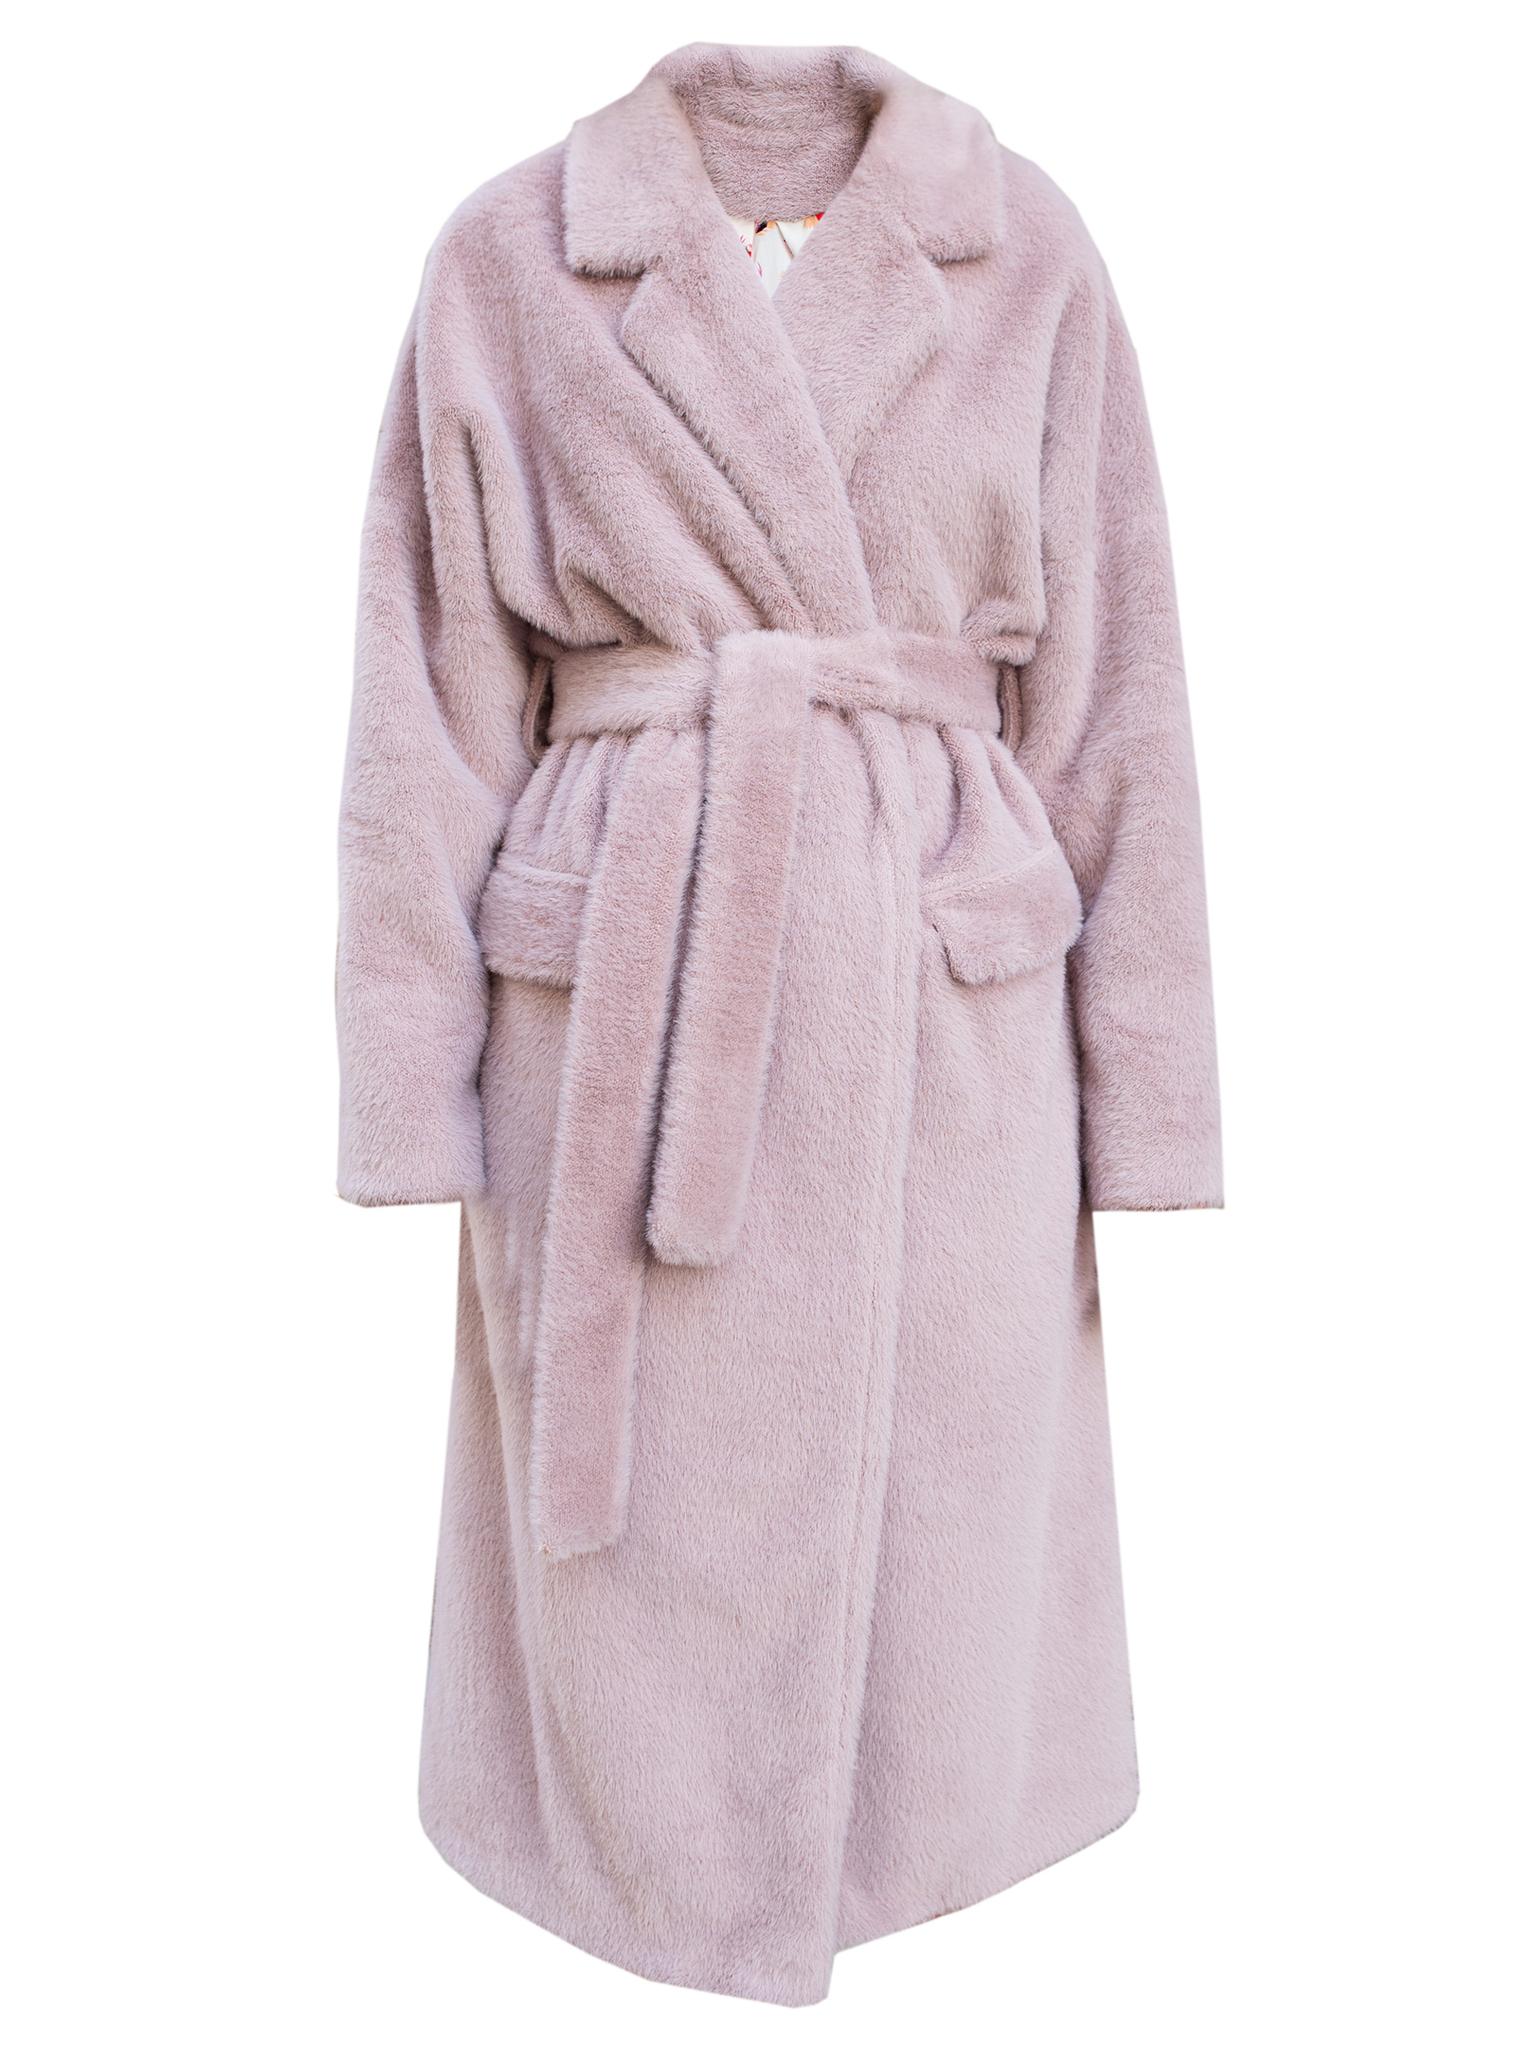 Плюшевое пальто-халат purple